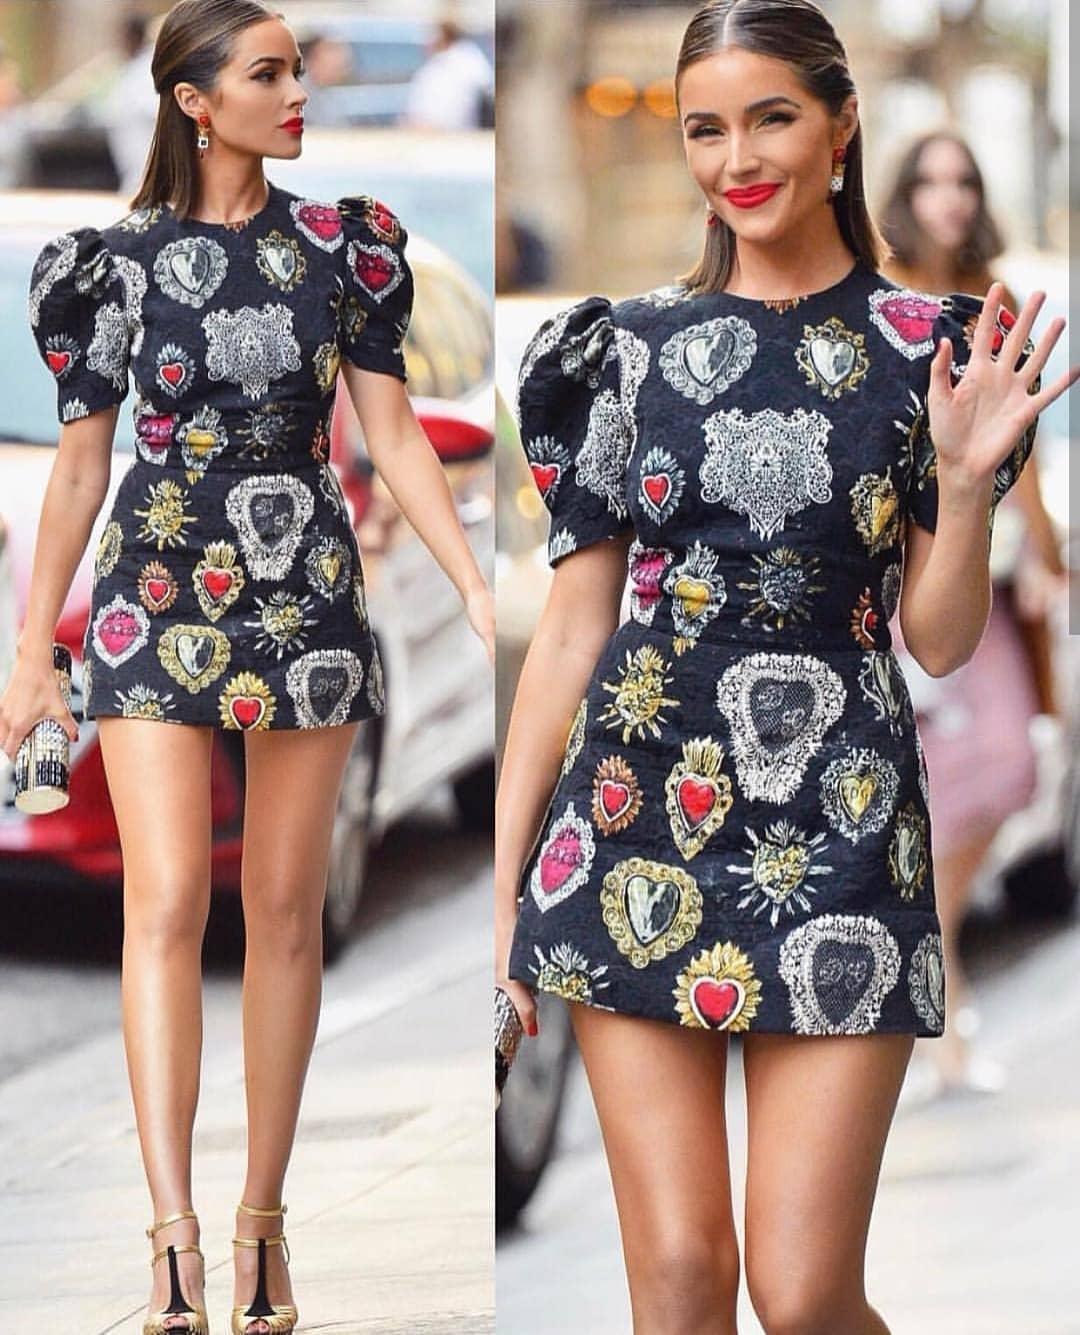 Short Puff Sleeve Black Printed Mini Dress For Summer 2019